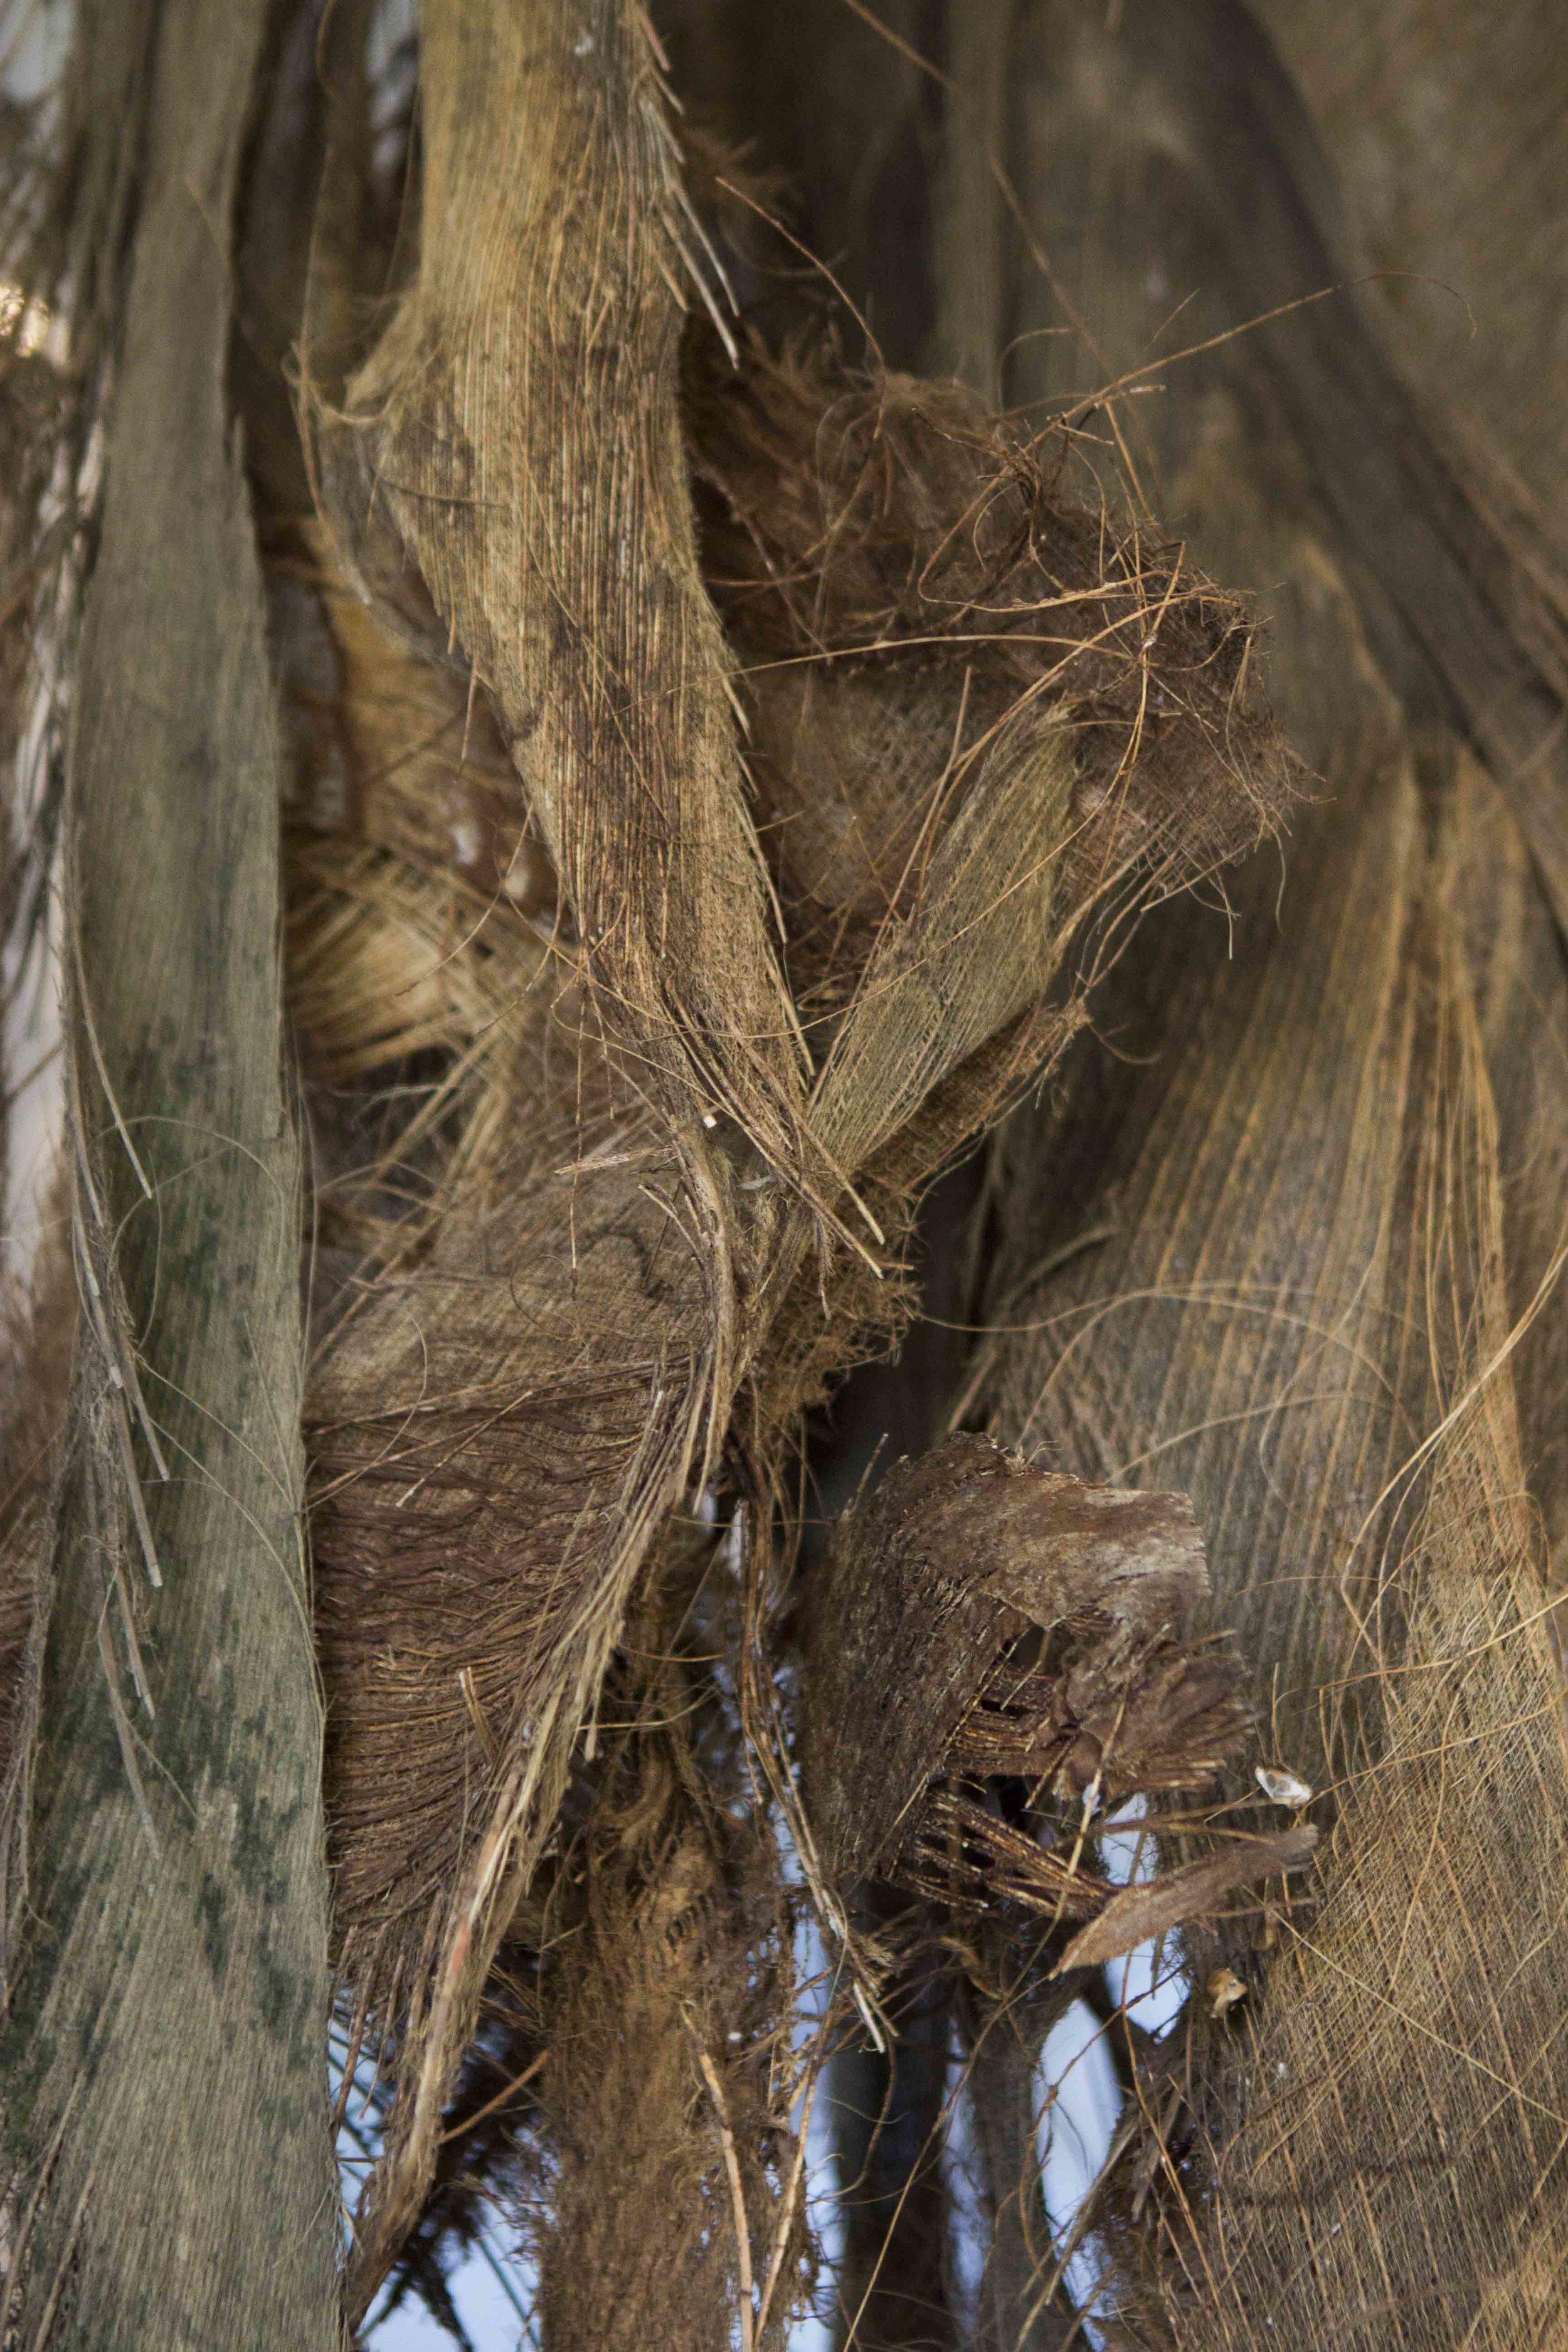 UNFOLD, Ane Krogseth,  2018. natural fibres, dried coconut palm.  Tropic 08ºN